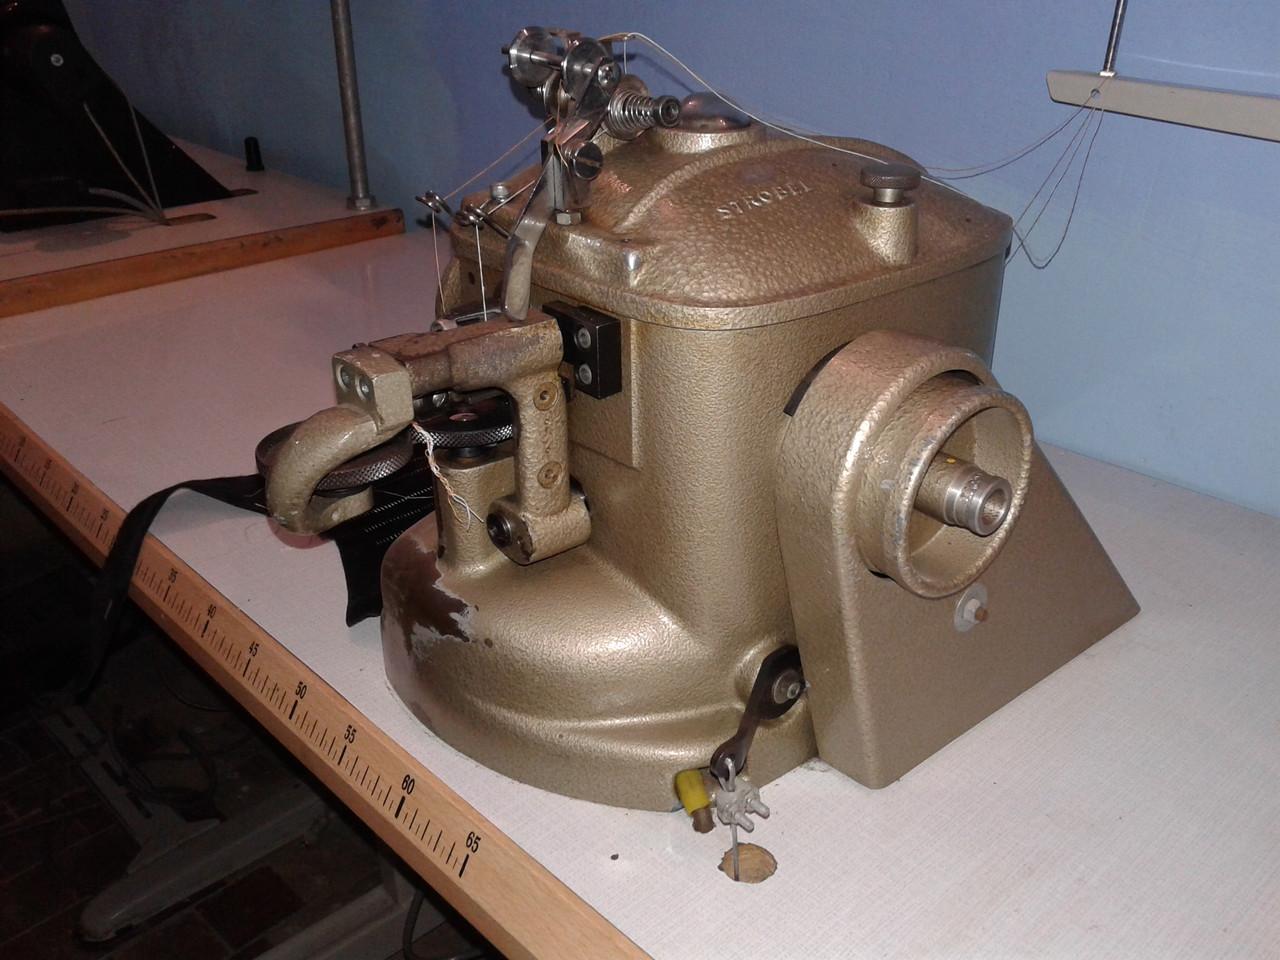 Скорняжная машина Strobel 142-30,10Б кл. Ankai AK-600, Typical GP 5-2,10Б. - Promstar в Хмельницком